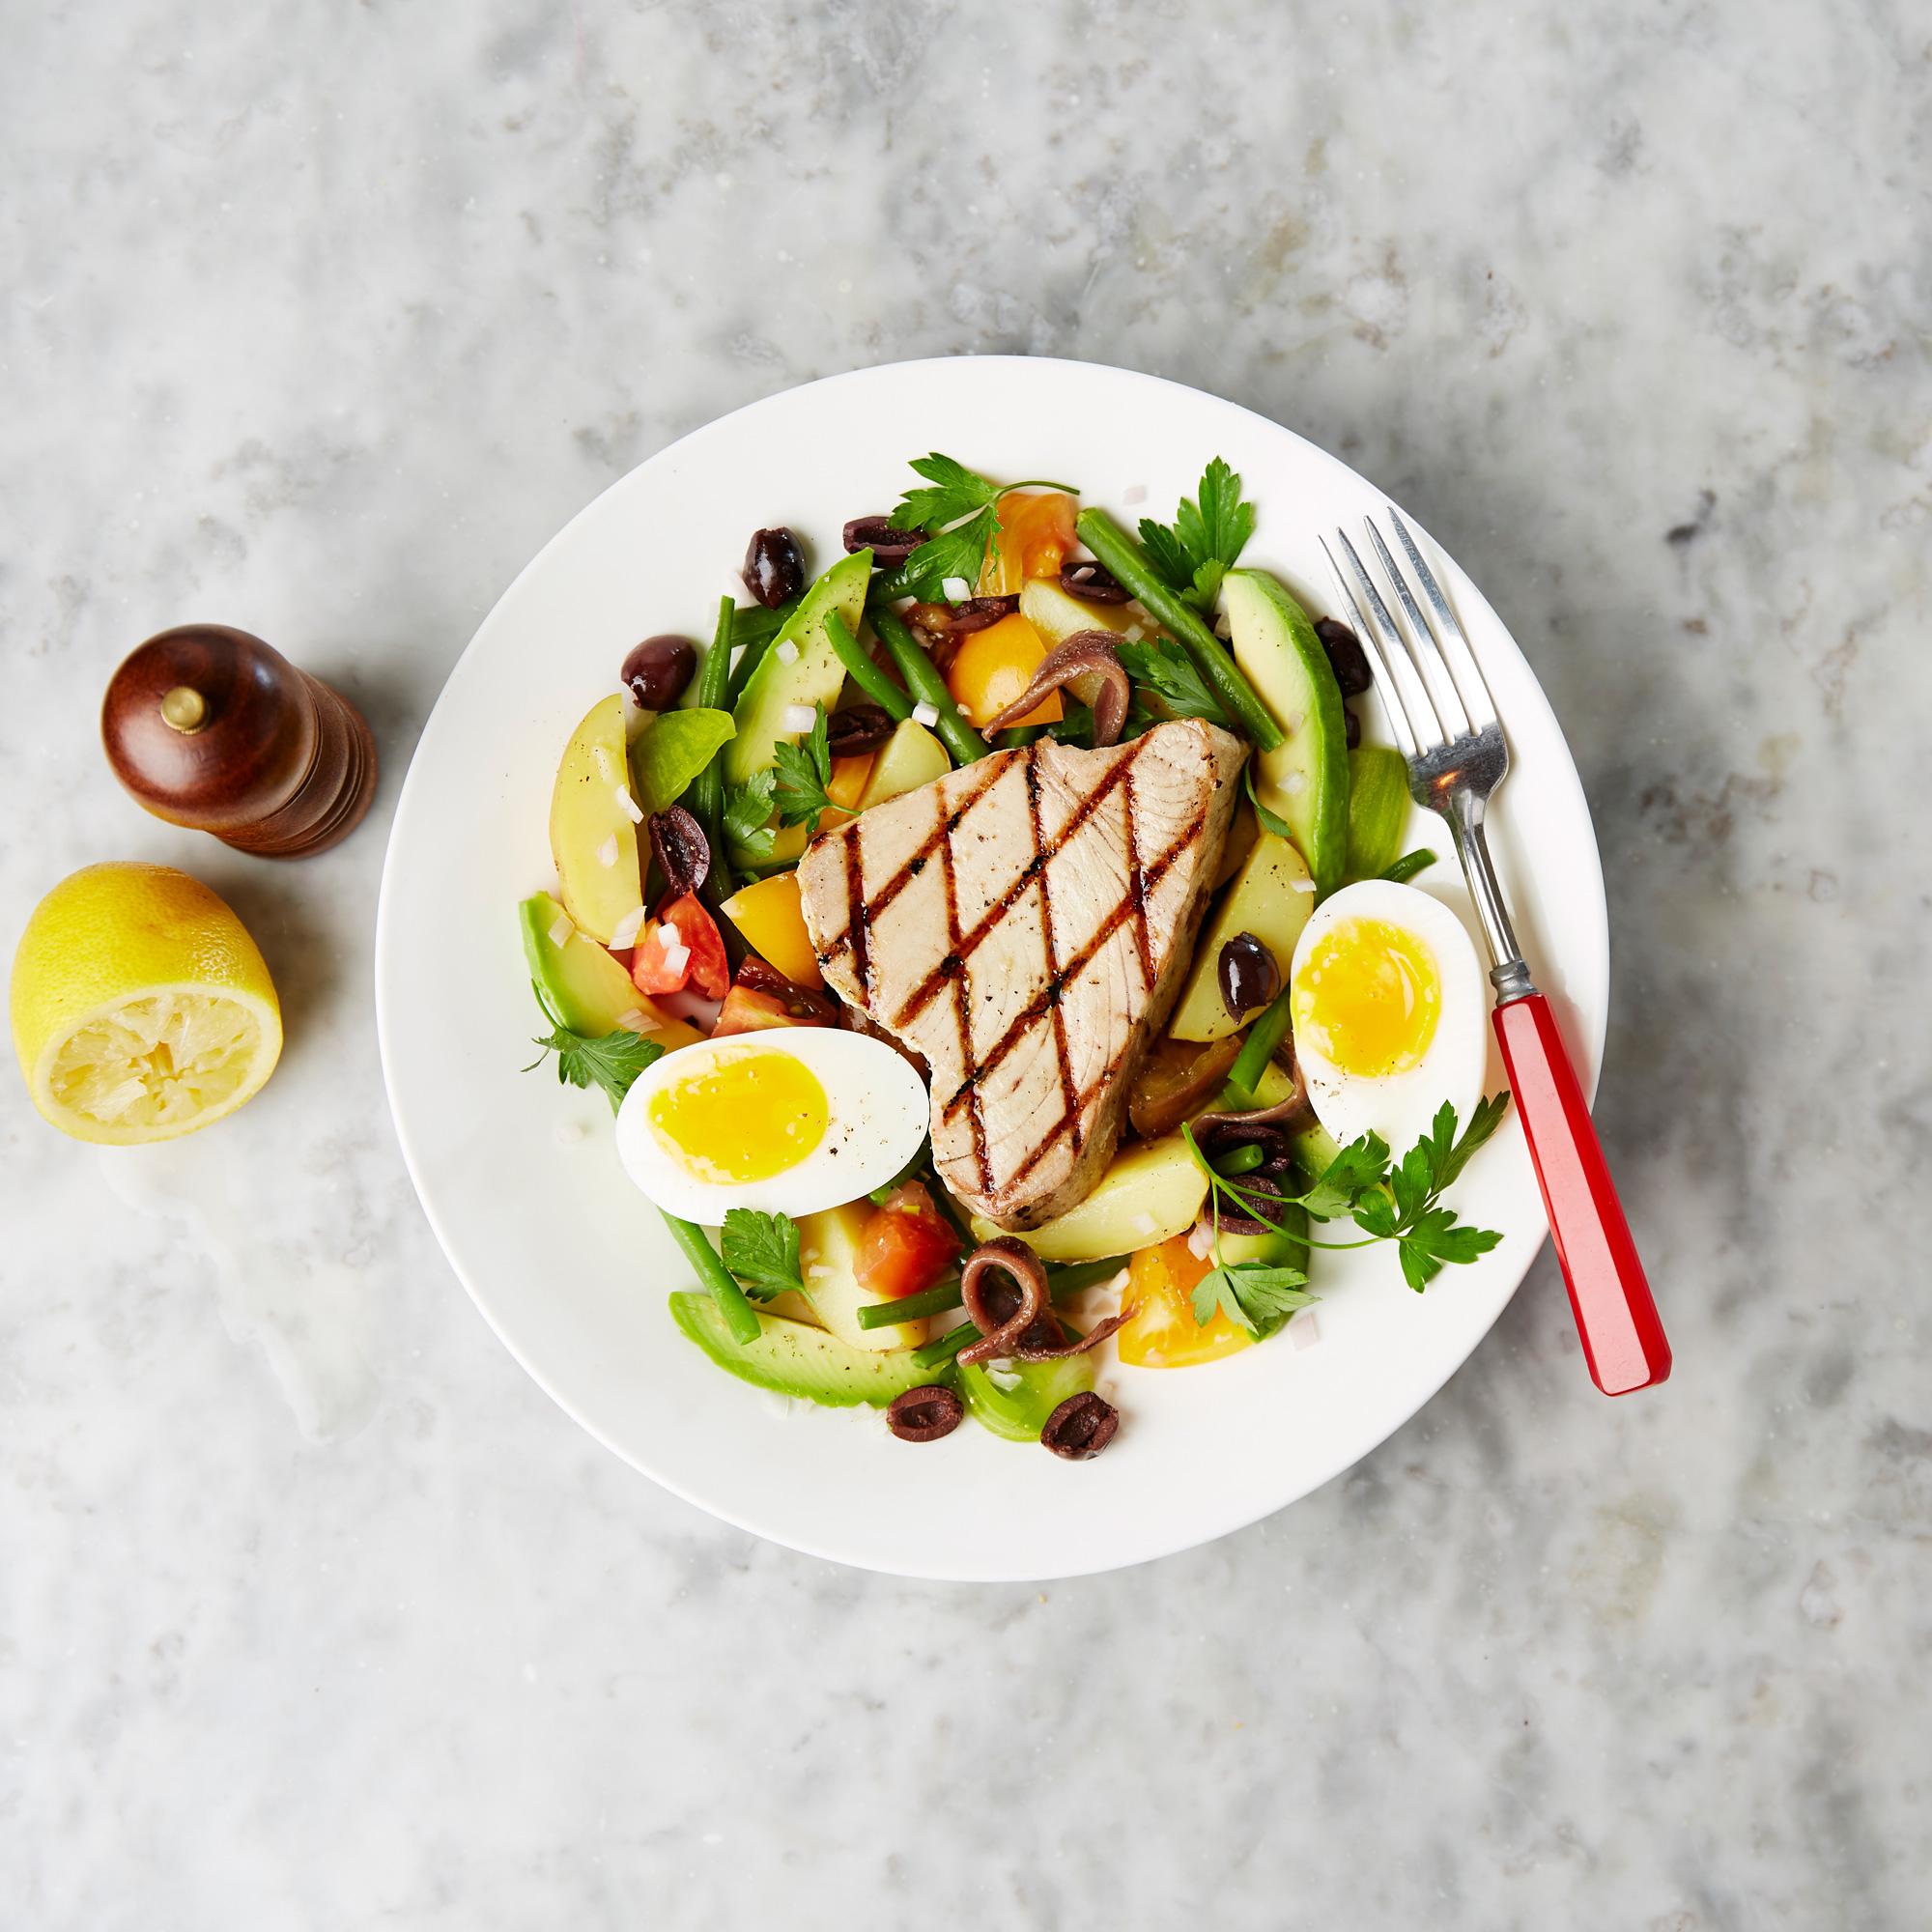 20180524-nicoise-salad159b-hrj.jpg